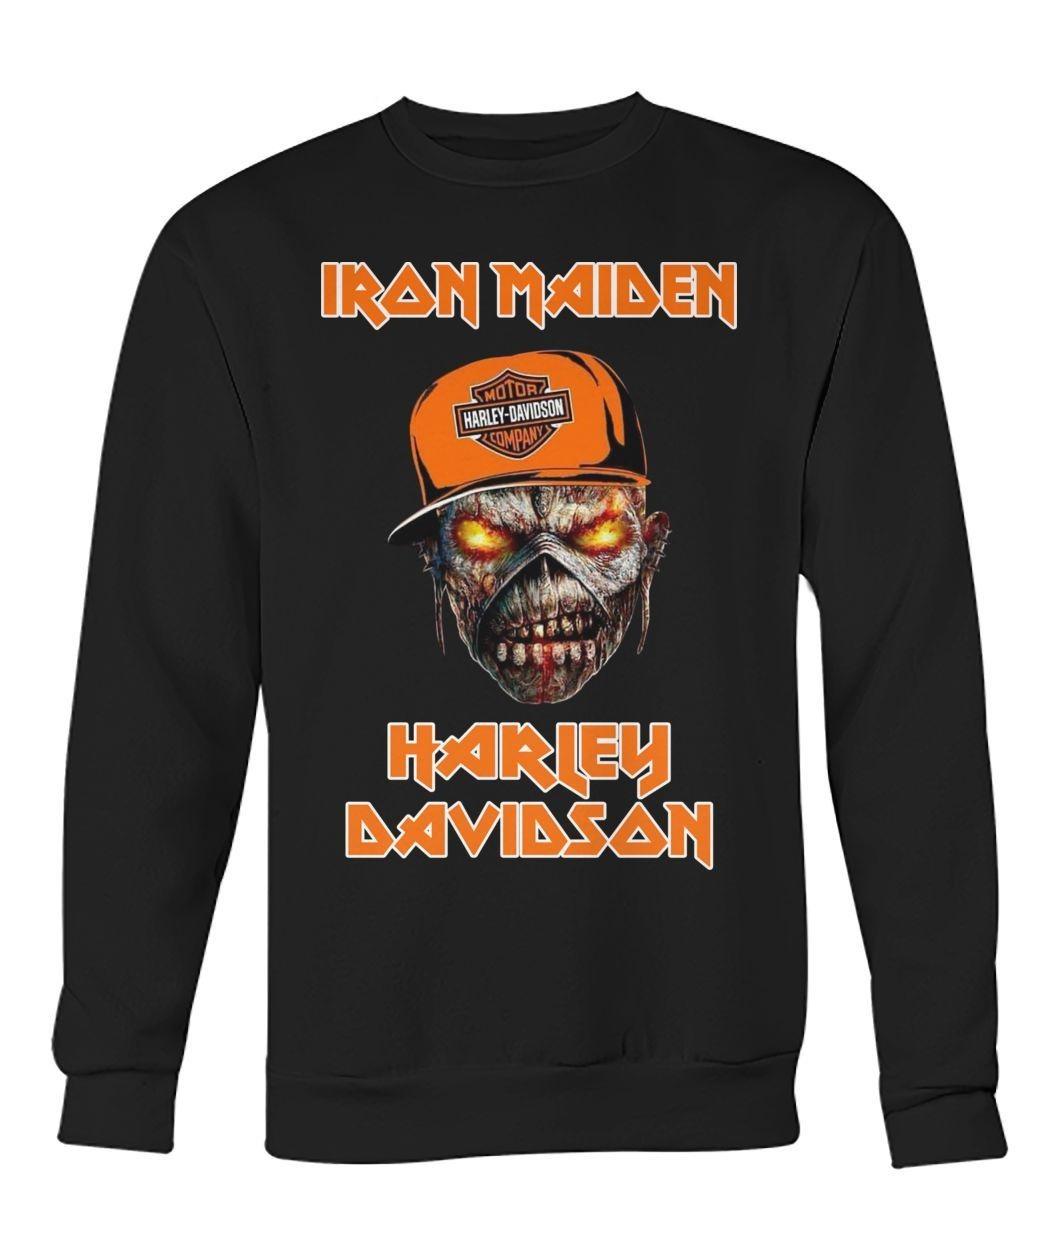 Iron Maiden Harley Davidson Skull shirt